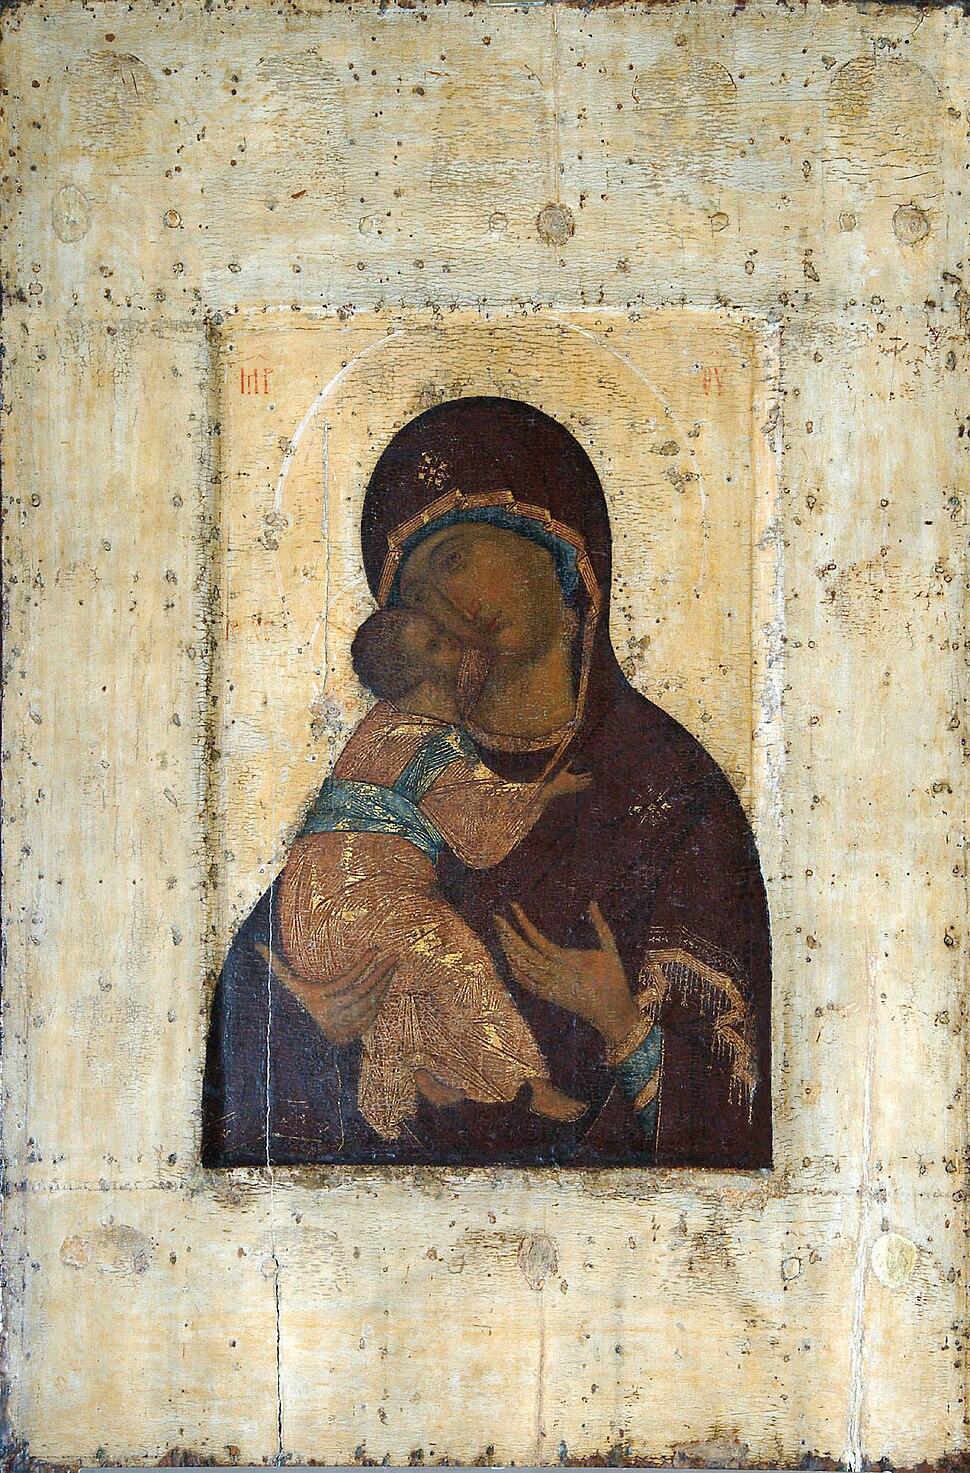 Vladimirskaya by A.Rublev (1395-1410s, Vladimir museum)